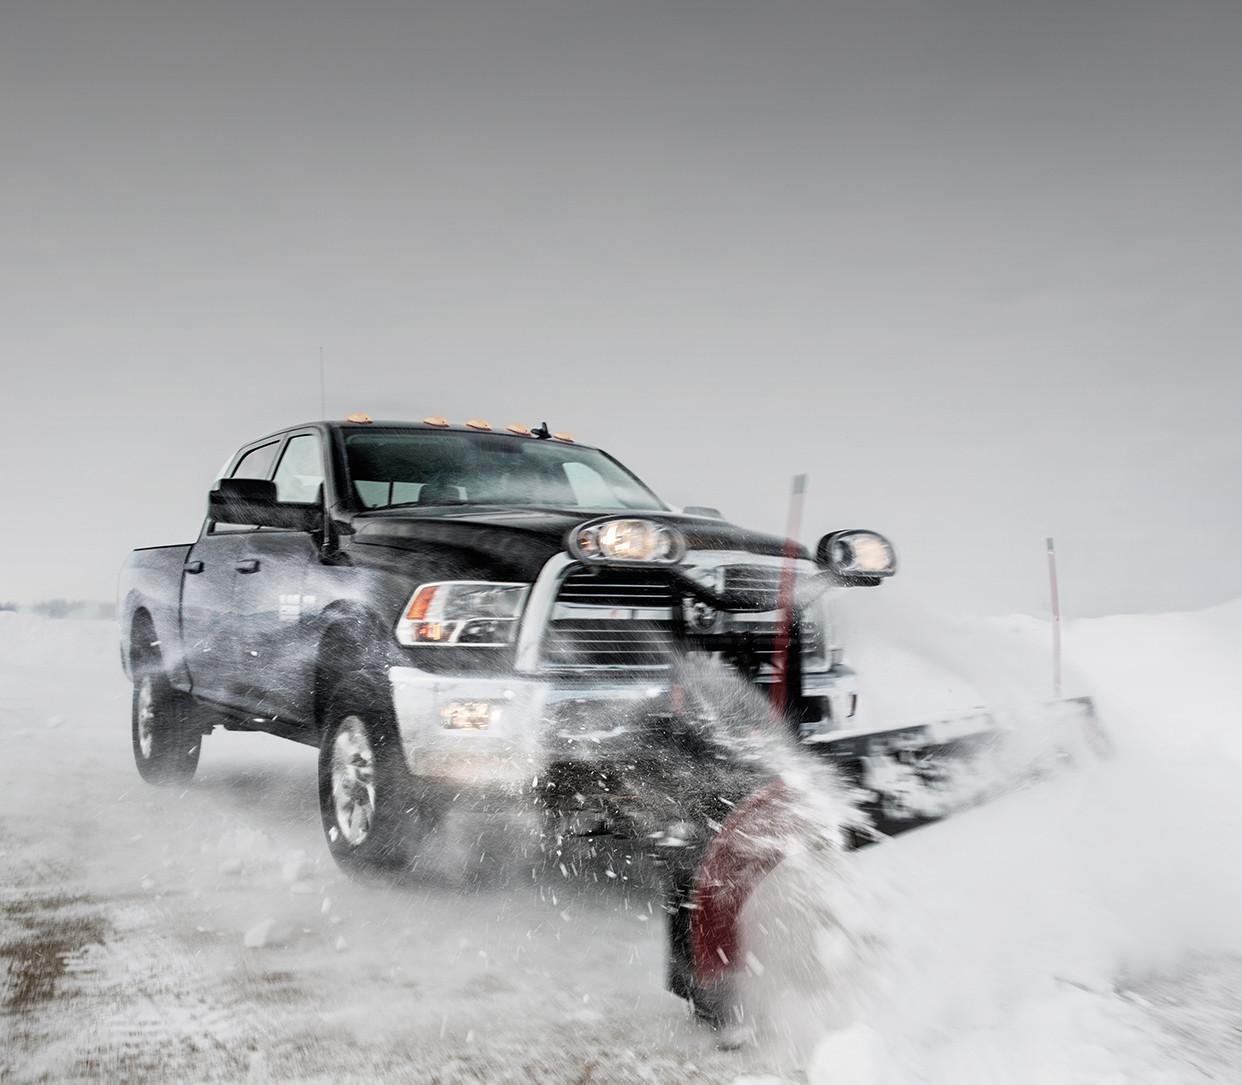 2018 Ram 2500 Pickup Truck Trucks Canada Dodge Maintenance Schedule Side View Shown In Black